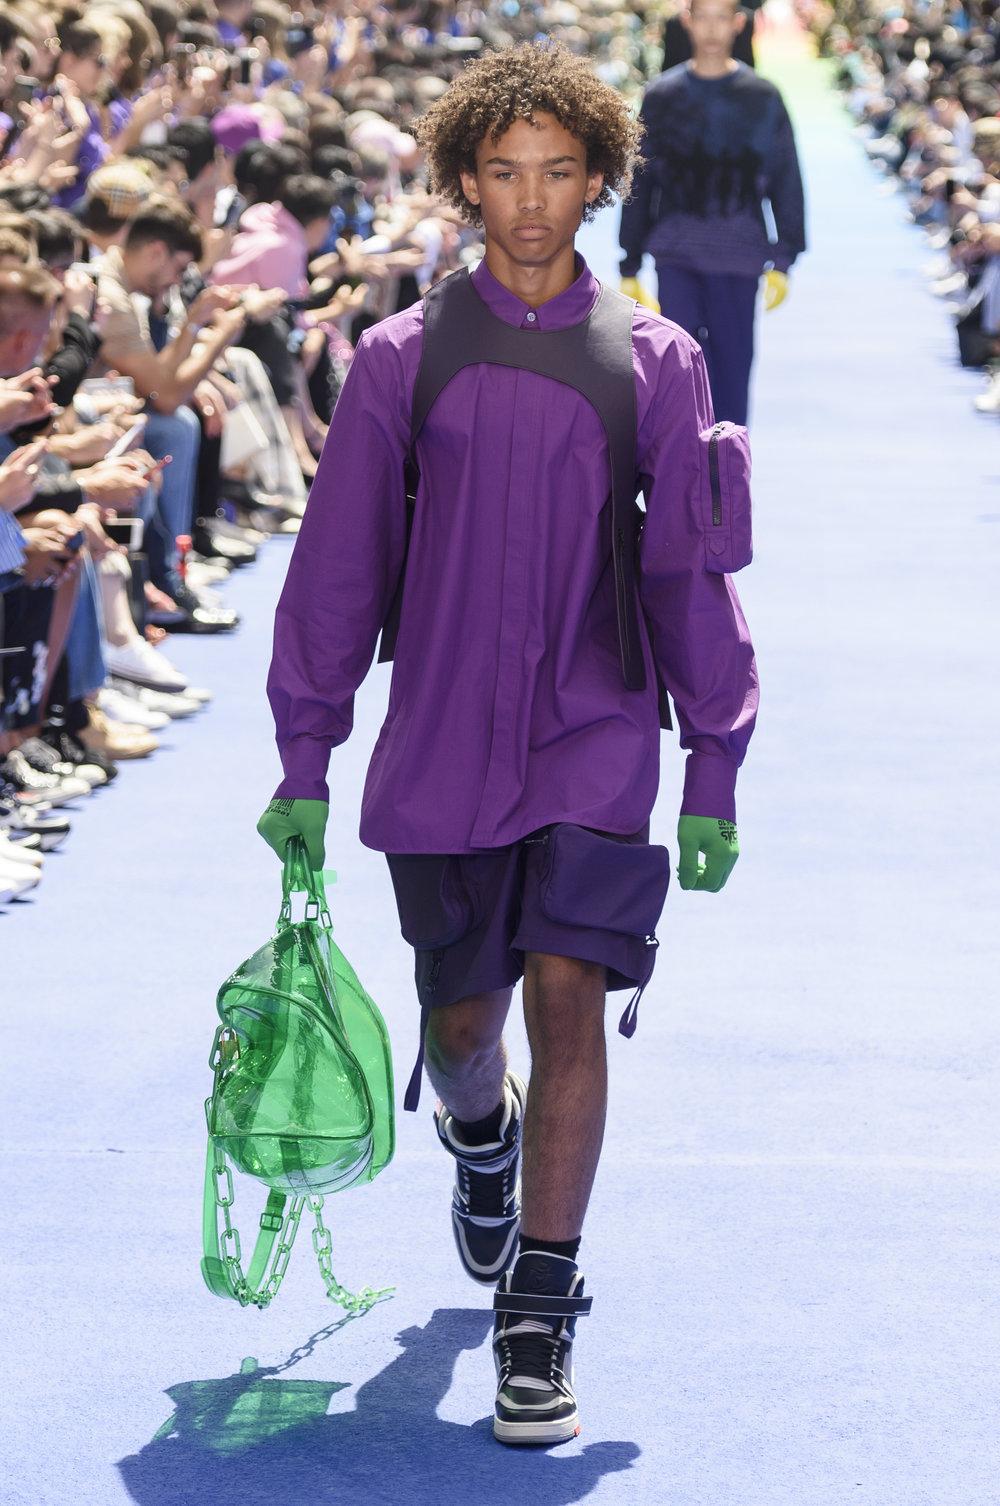 43_Louis_Vuitton_original_vui_prs_ss19_130.jpg